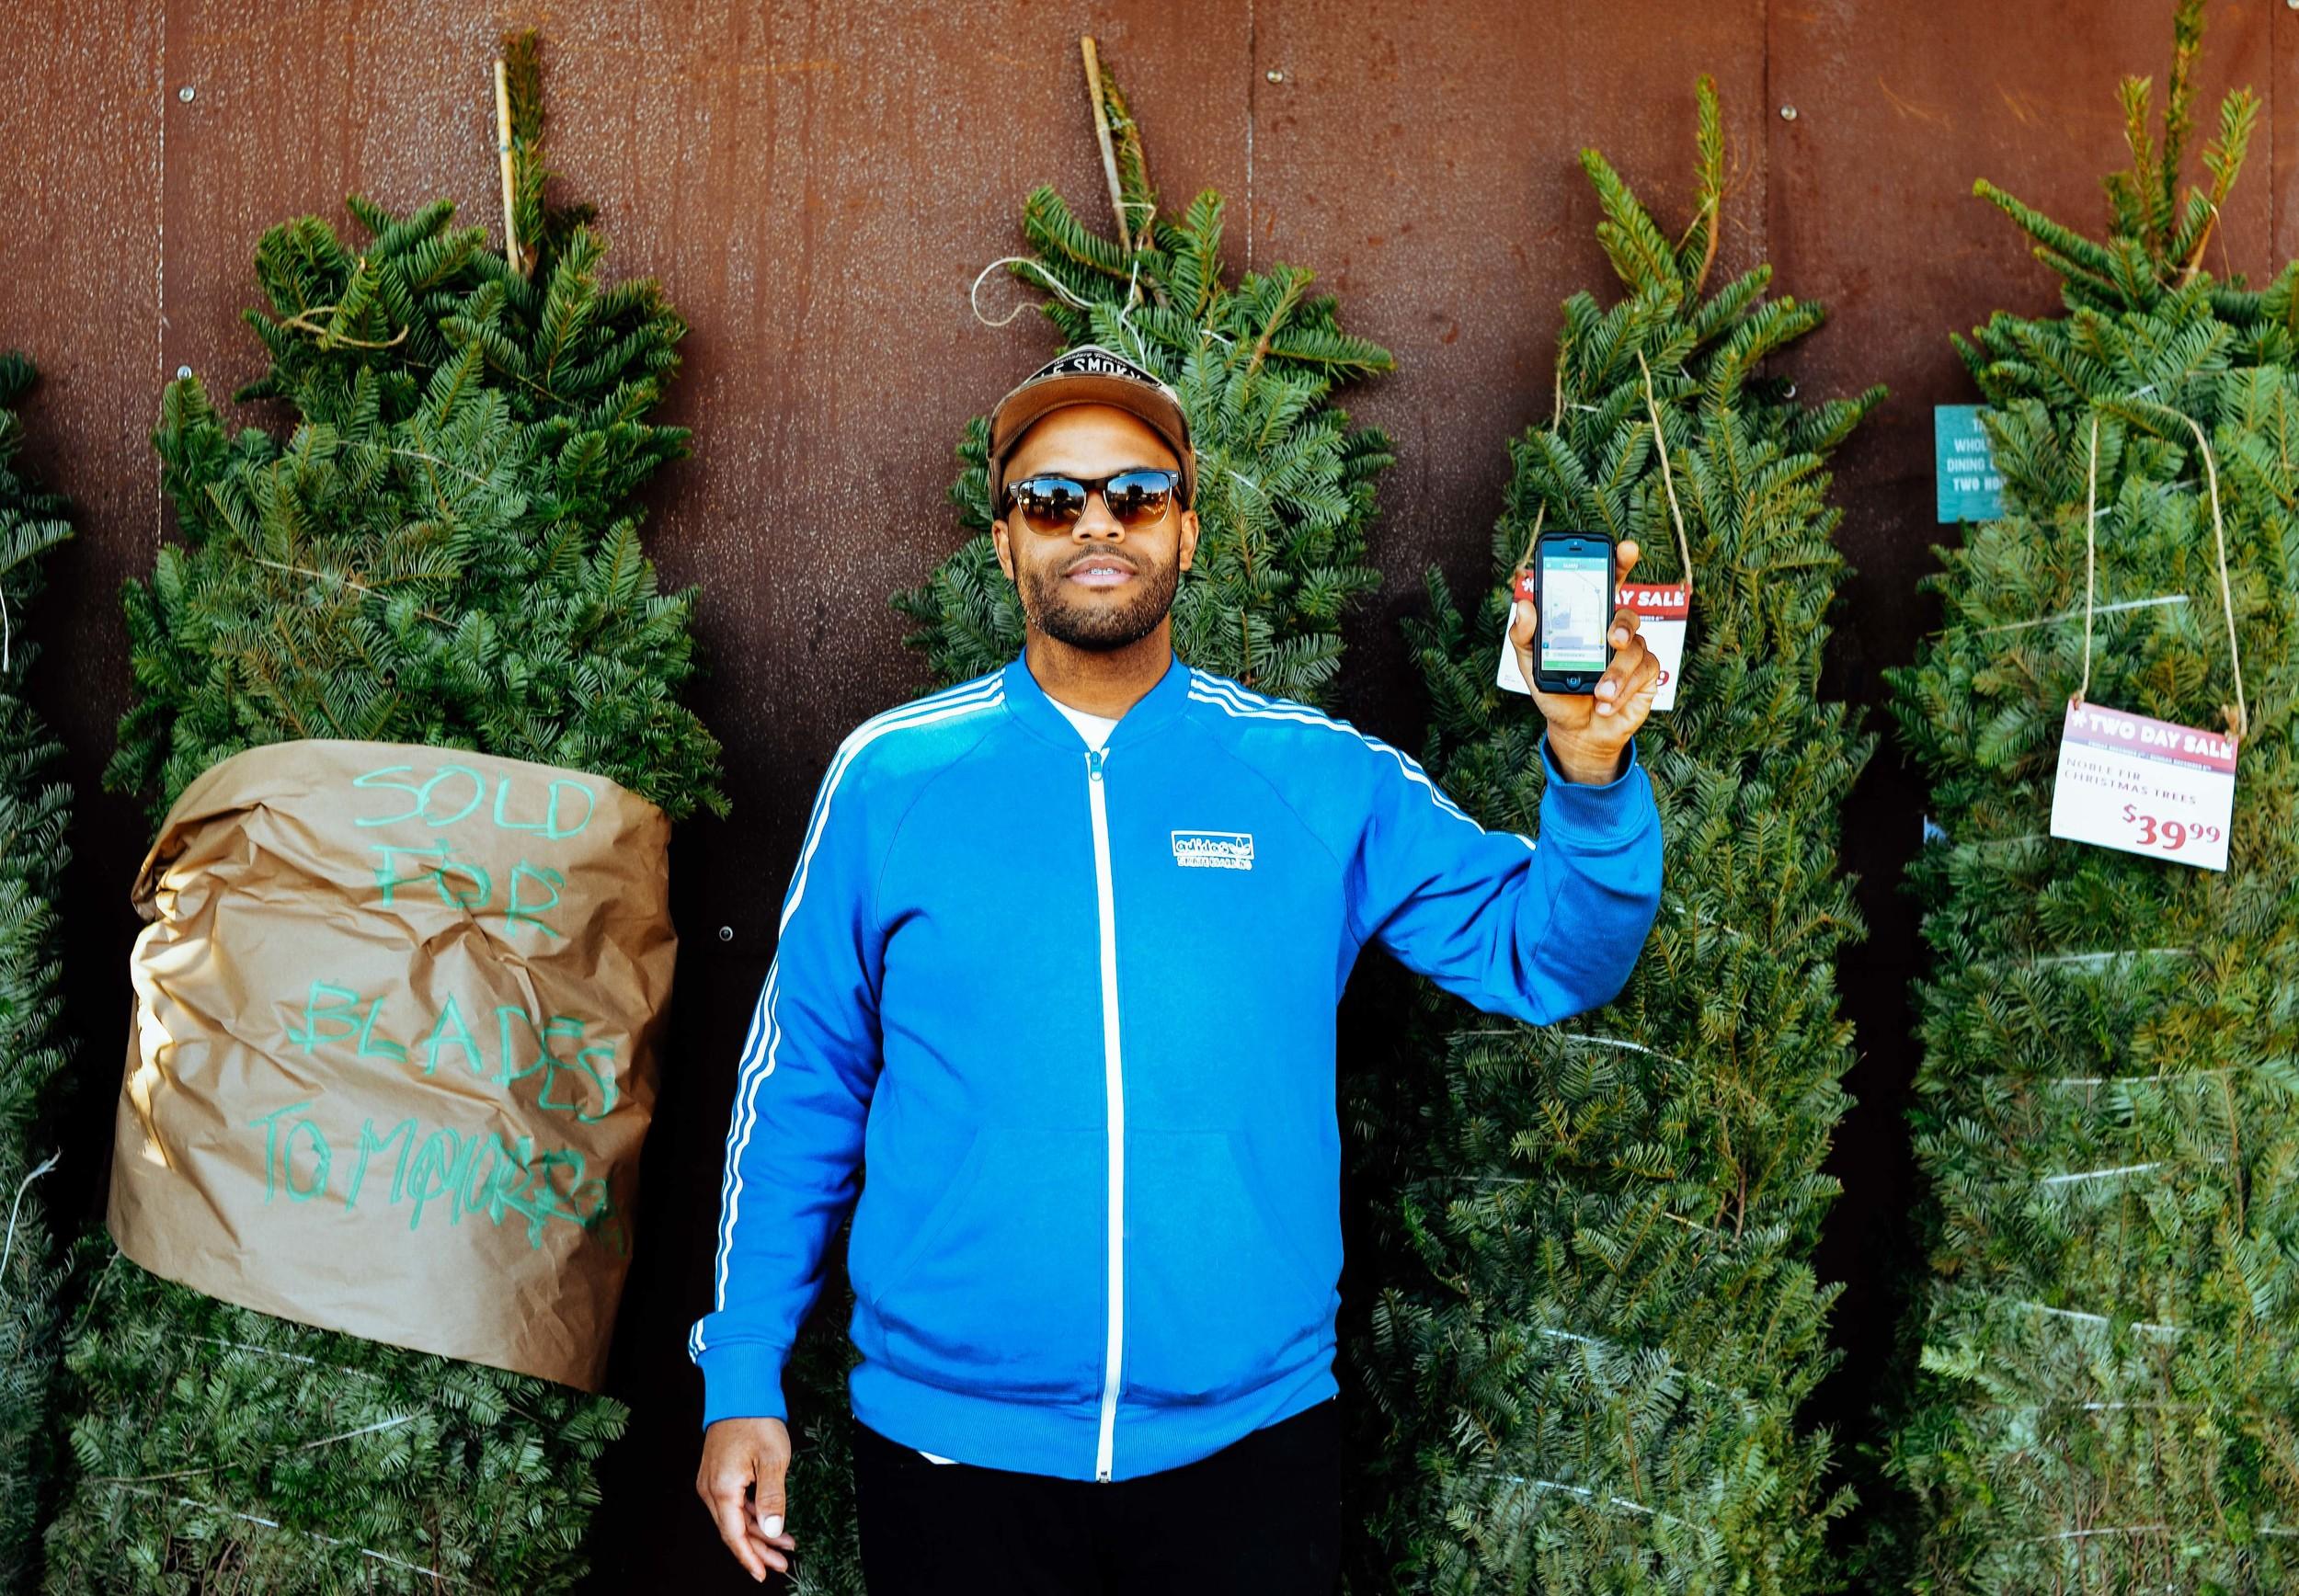 Buddytruk_ChristmasTree_Channing-6772.jpg